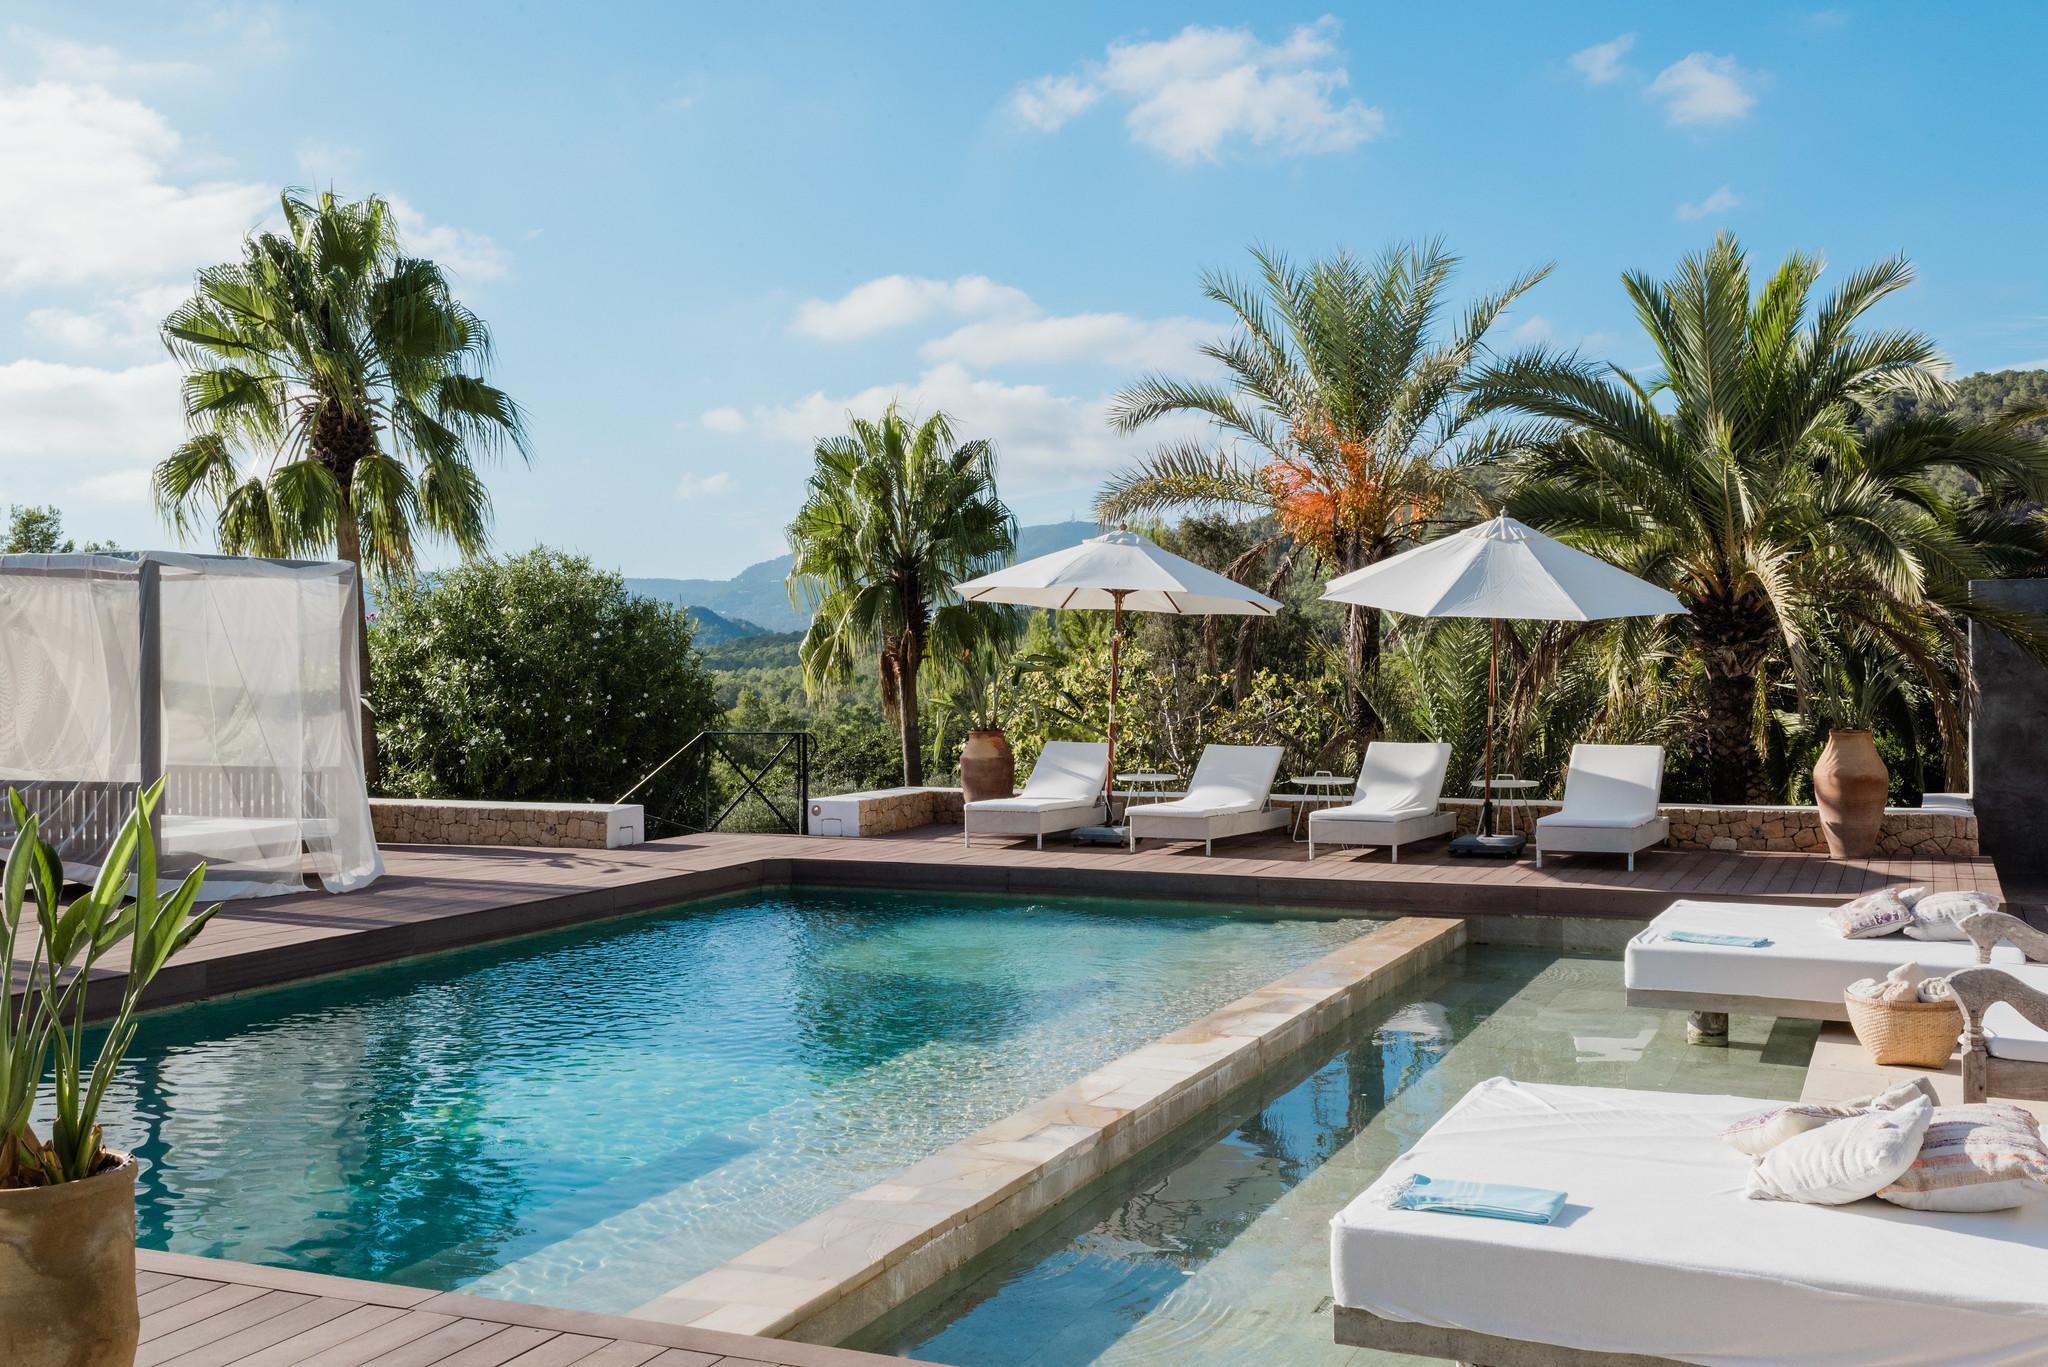 https://www.white-ibiza.com/wp-content/uploads/2020/05/white-ibiza-villas-casa-amalia-exterior-pool.jpg